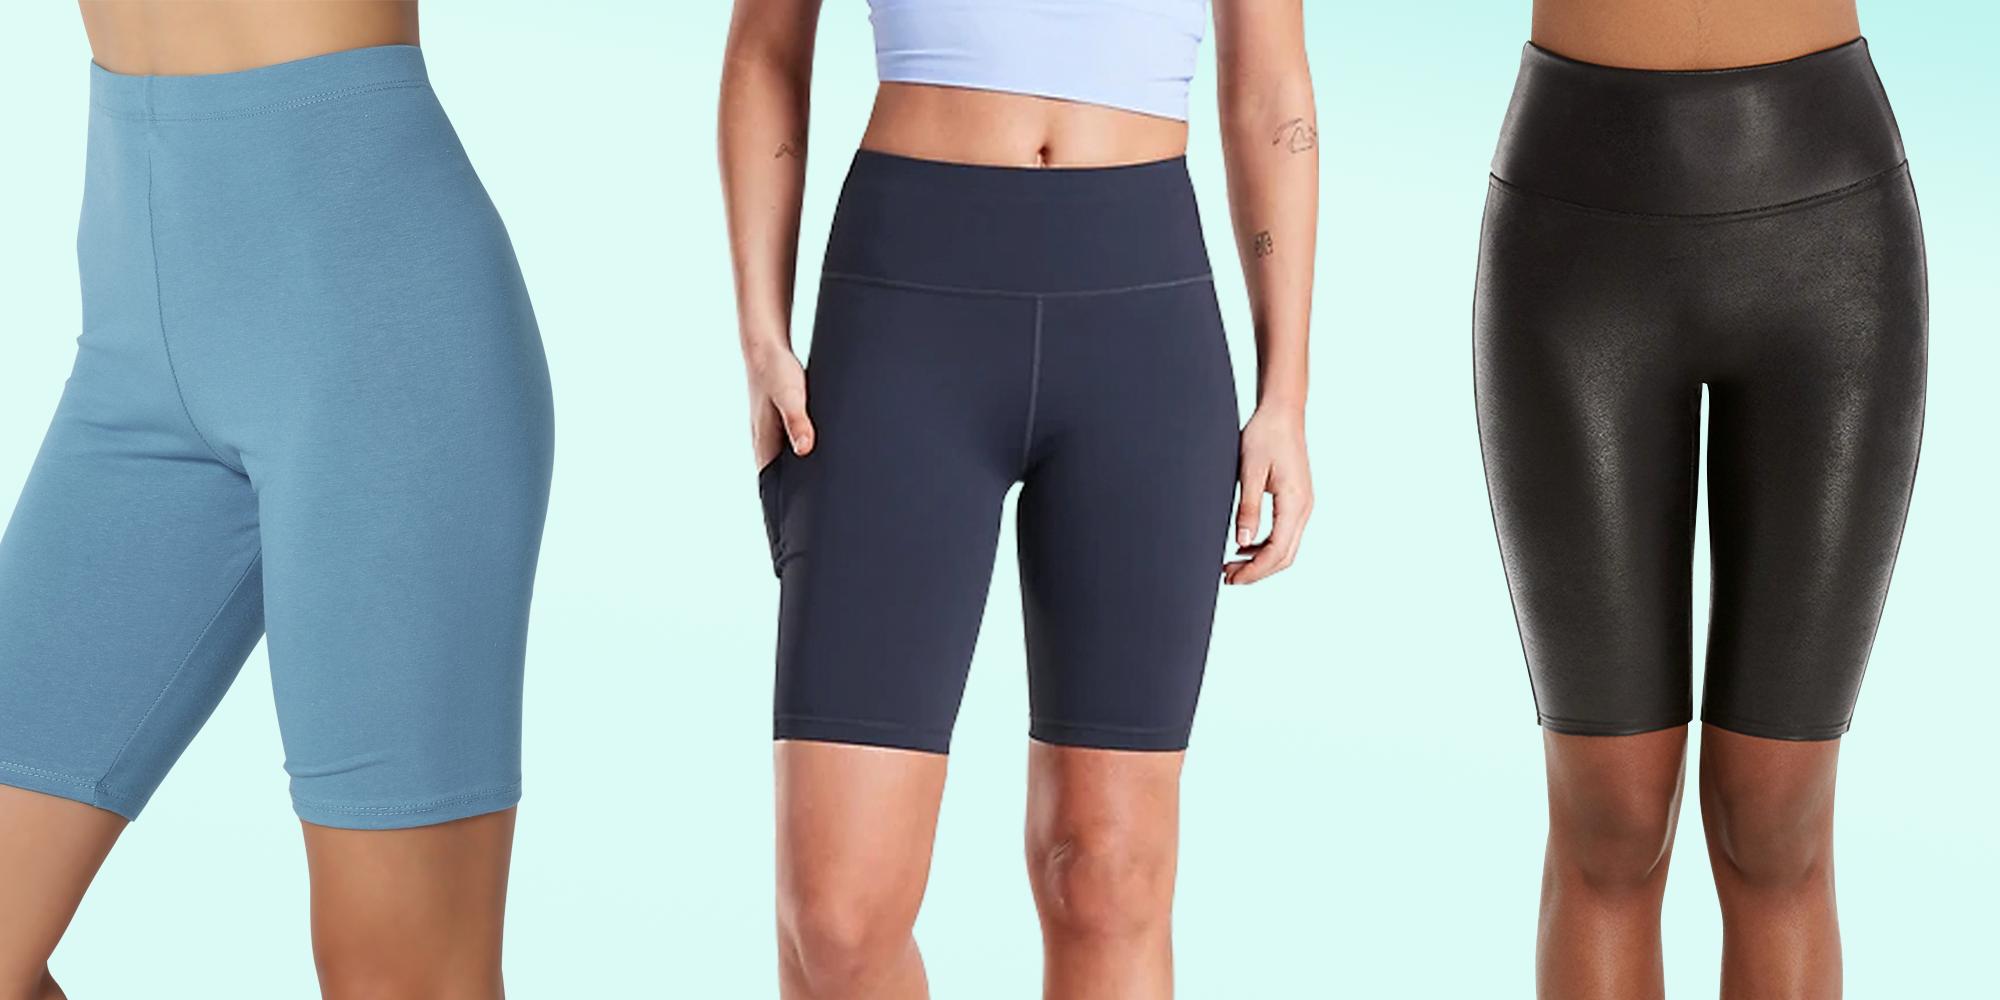 Wife Spandex Shorts | Niche Top Mature